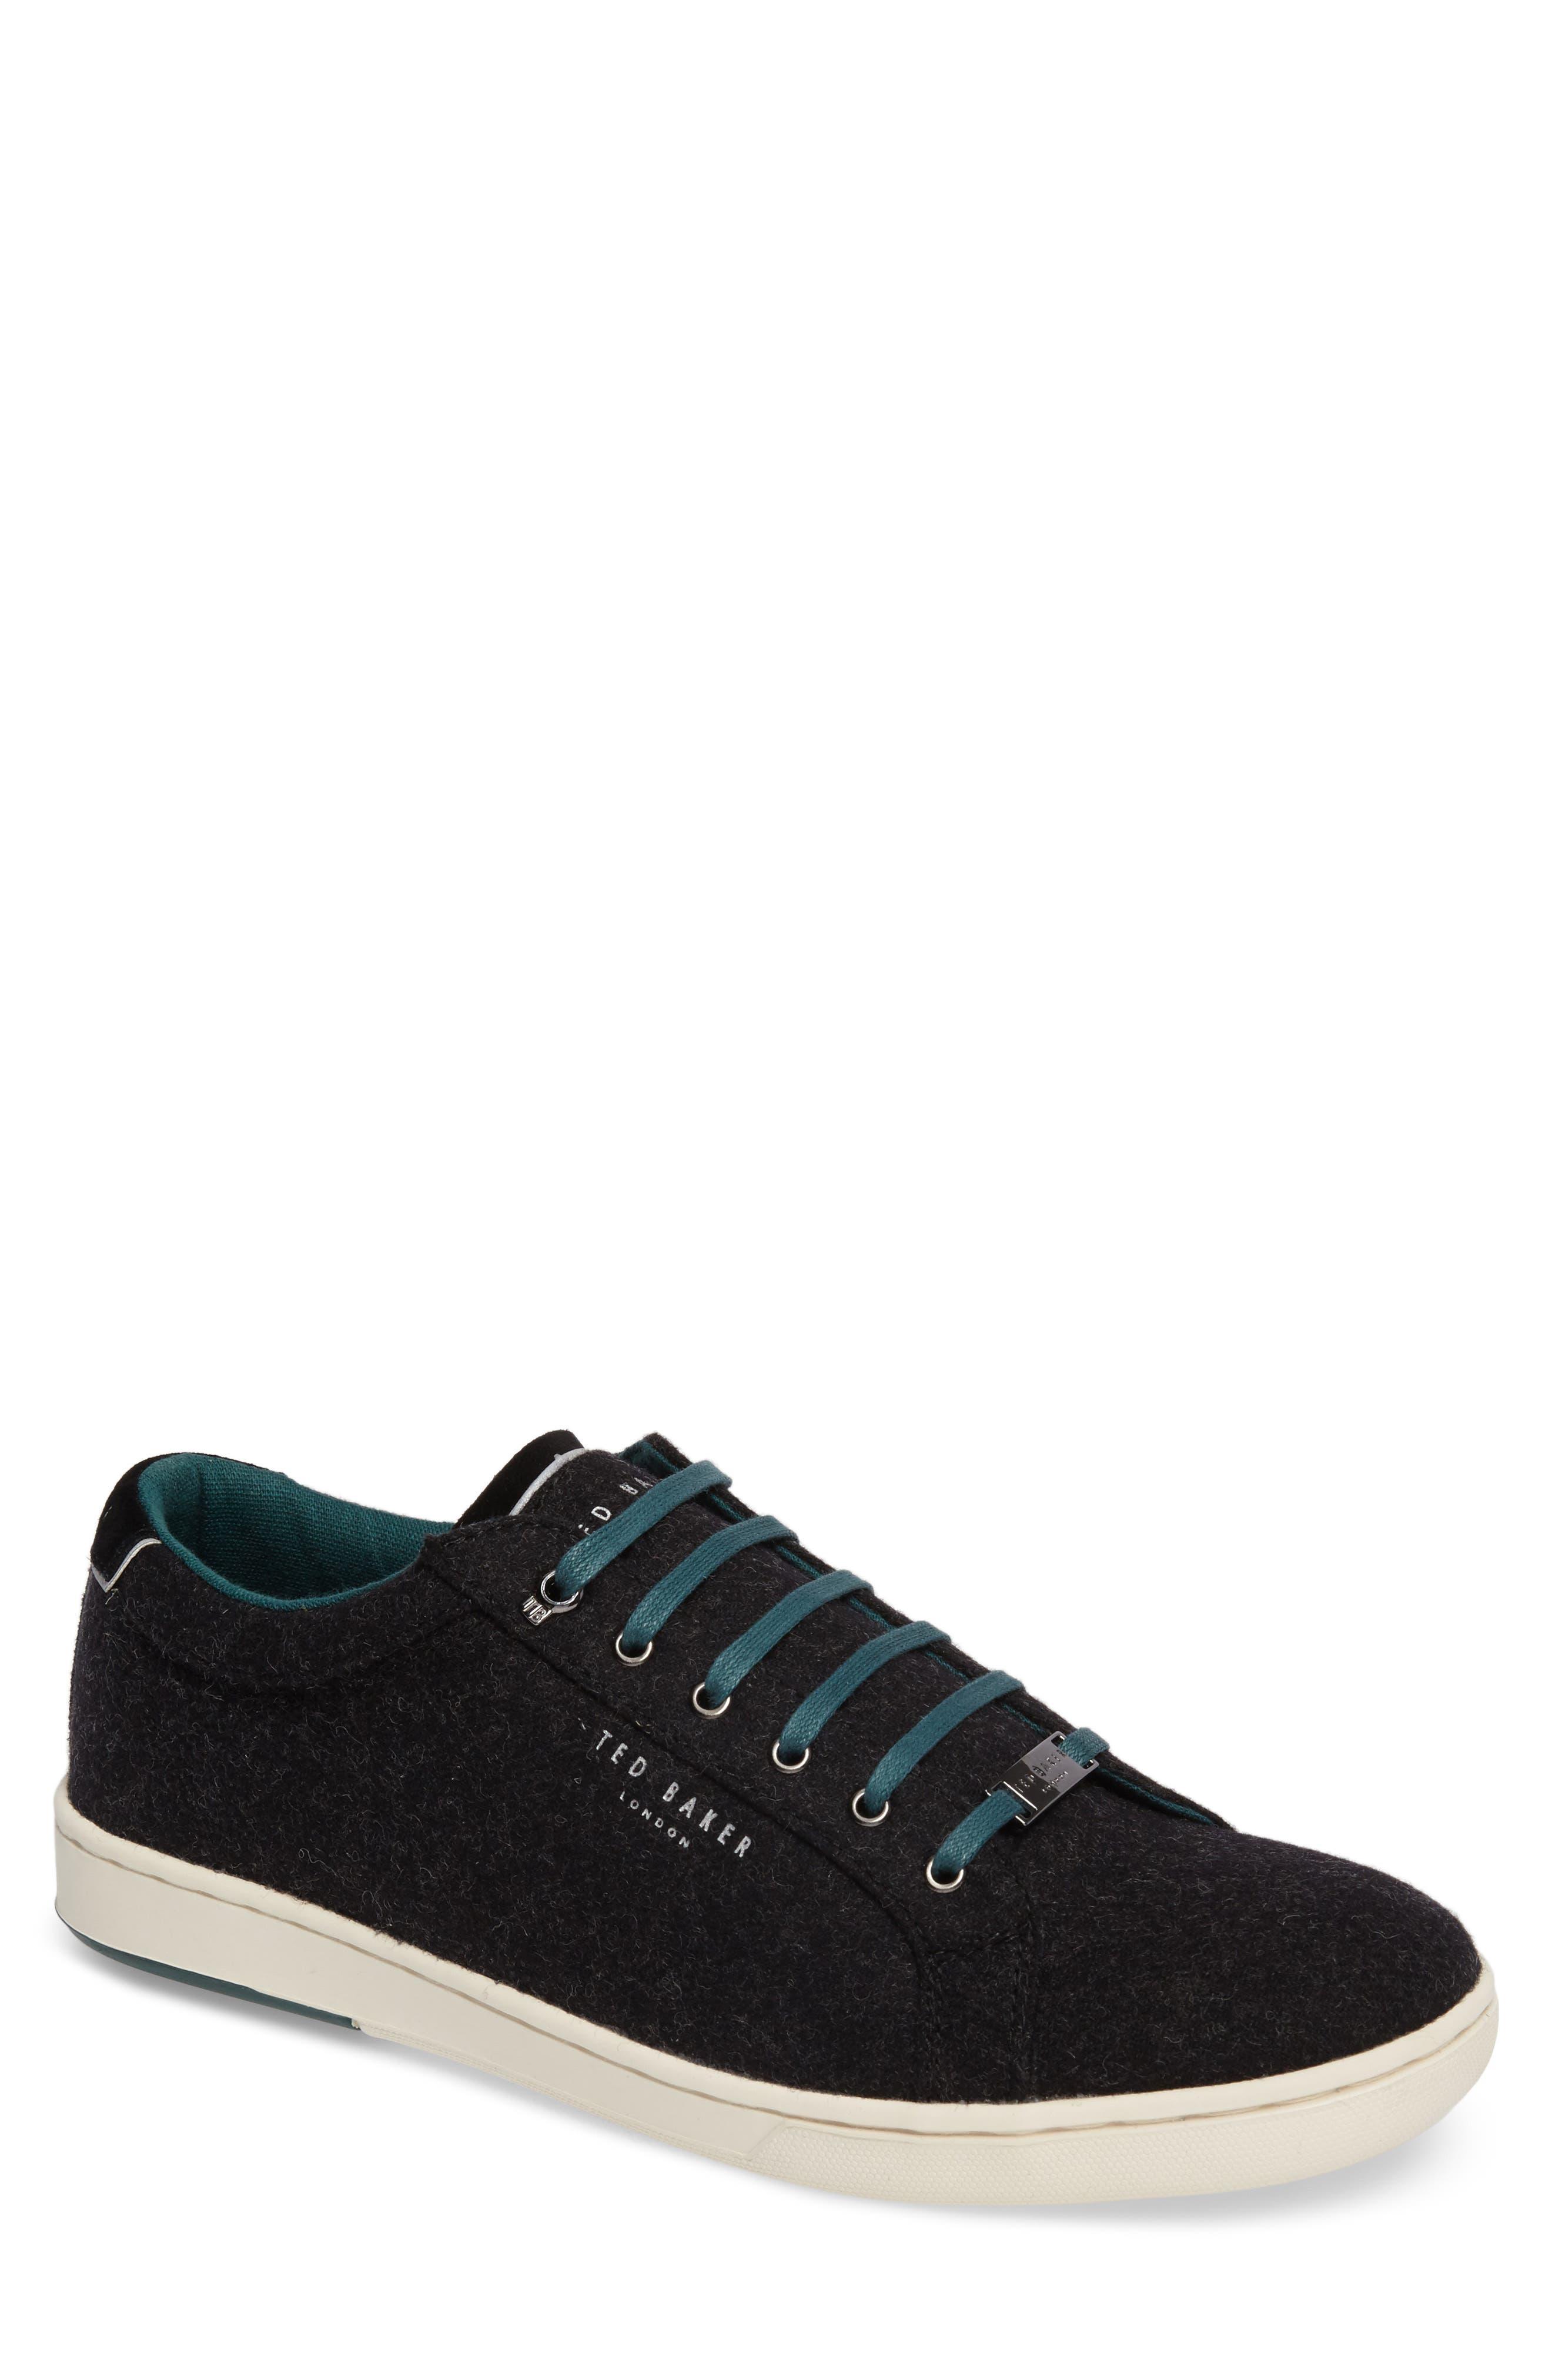 Minem 3 Sneaker,                         Main,                         color, Black Wool